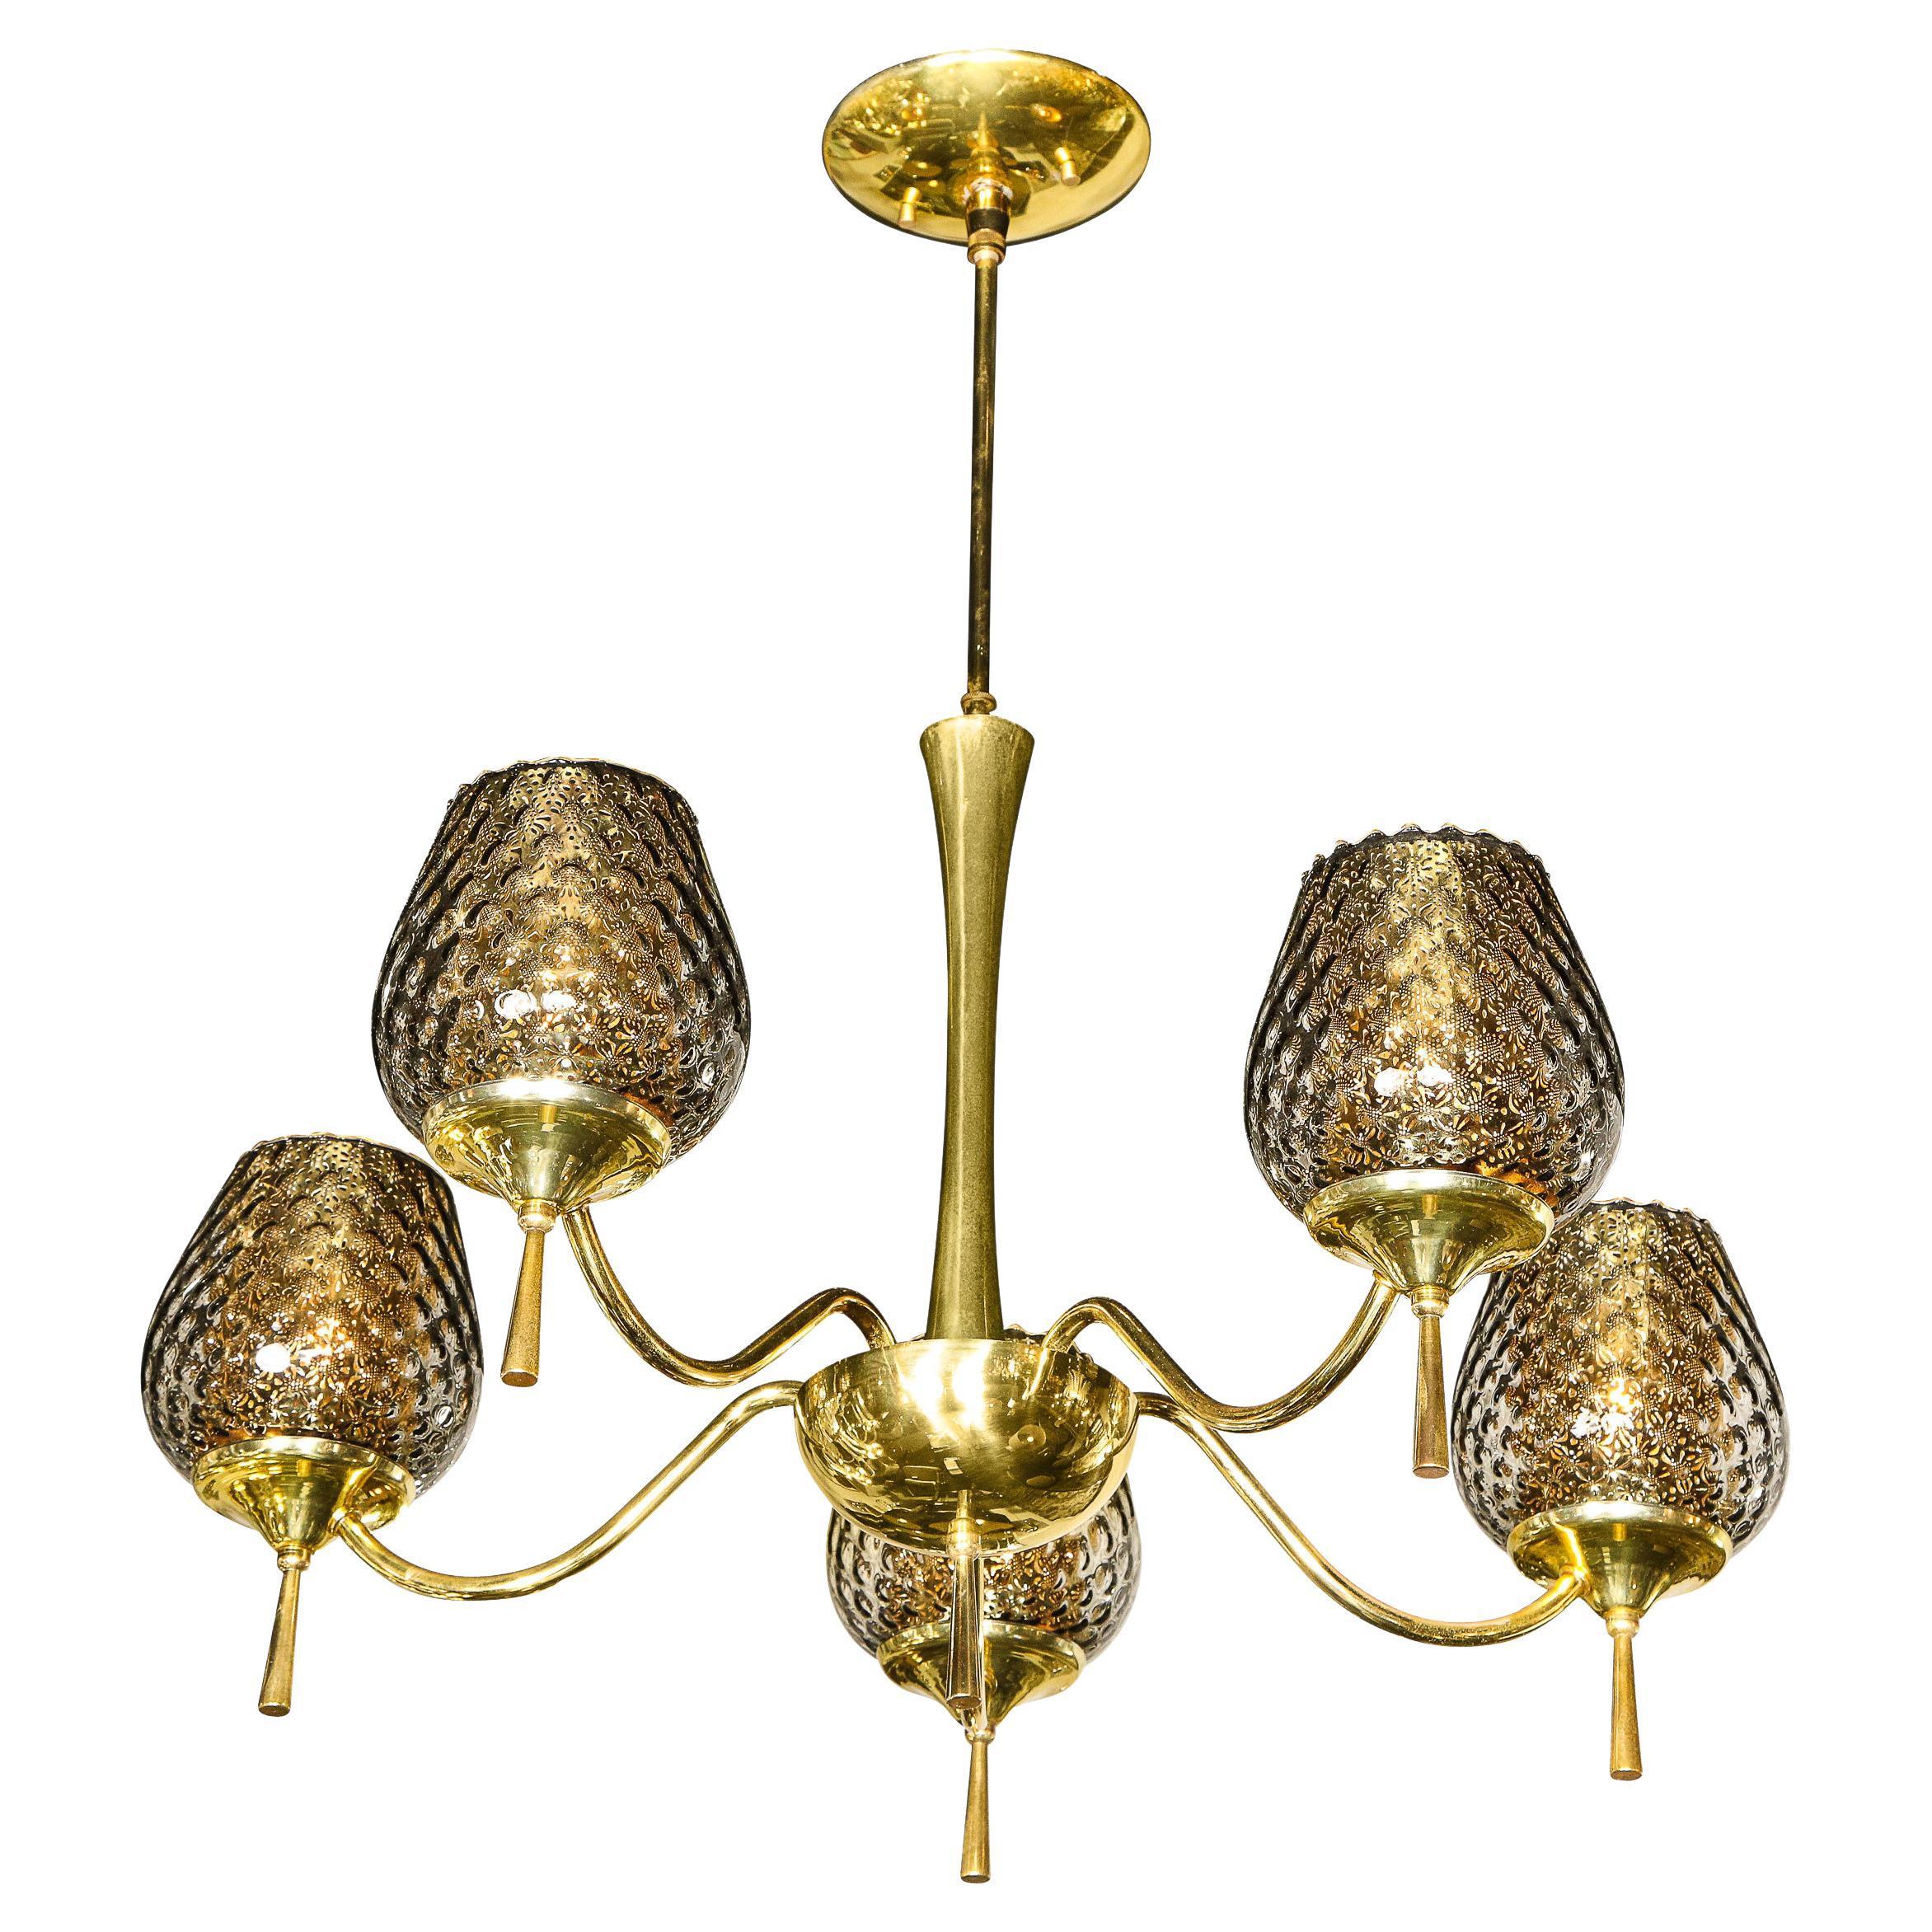 Mid Century Modern Five Arm Brass & Smoked Textured Murano Glass Chandelier